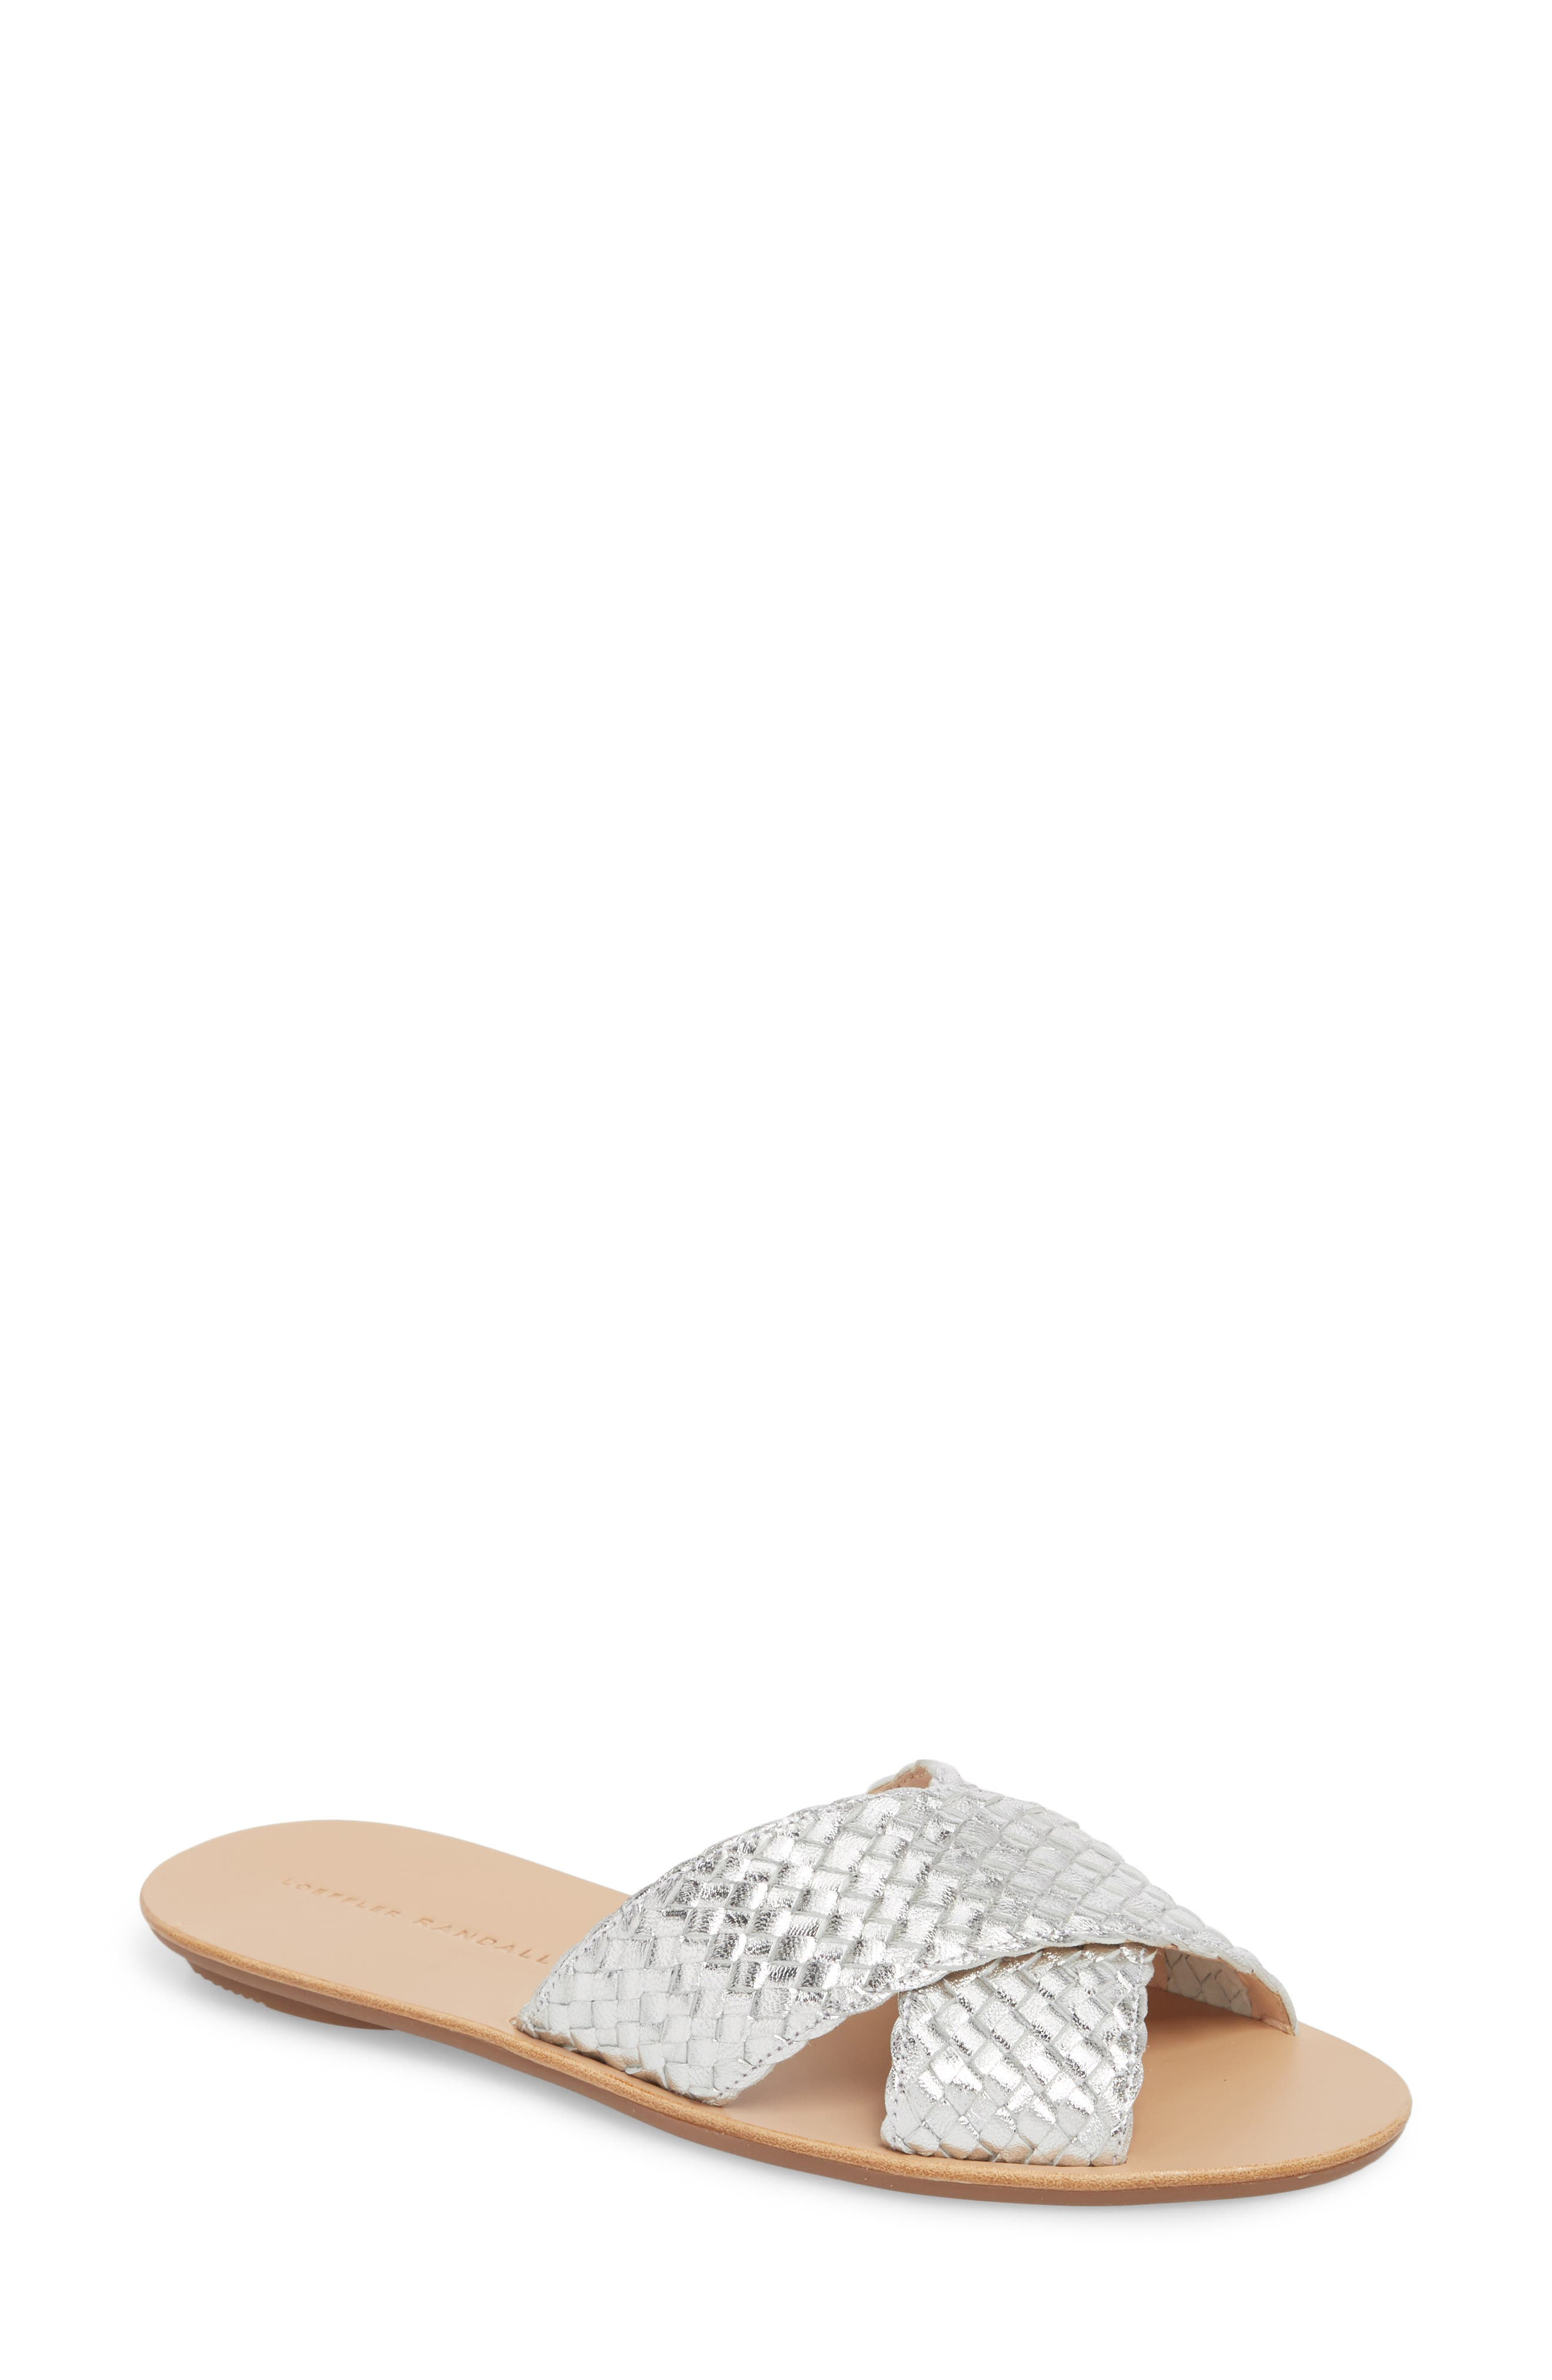 Claudie Slide Sandal,                         Main,                         color, SILVER